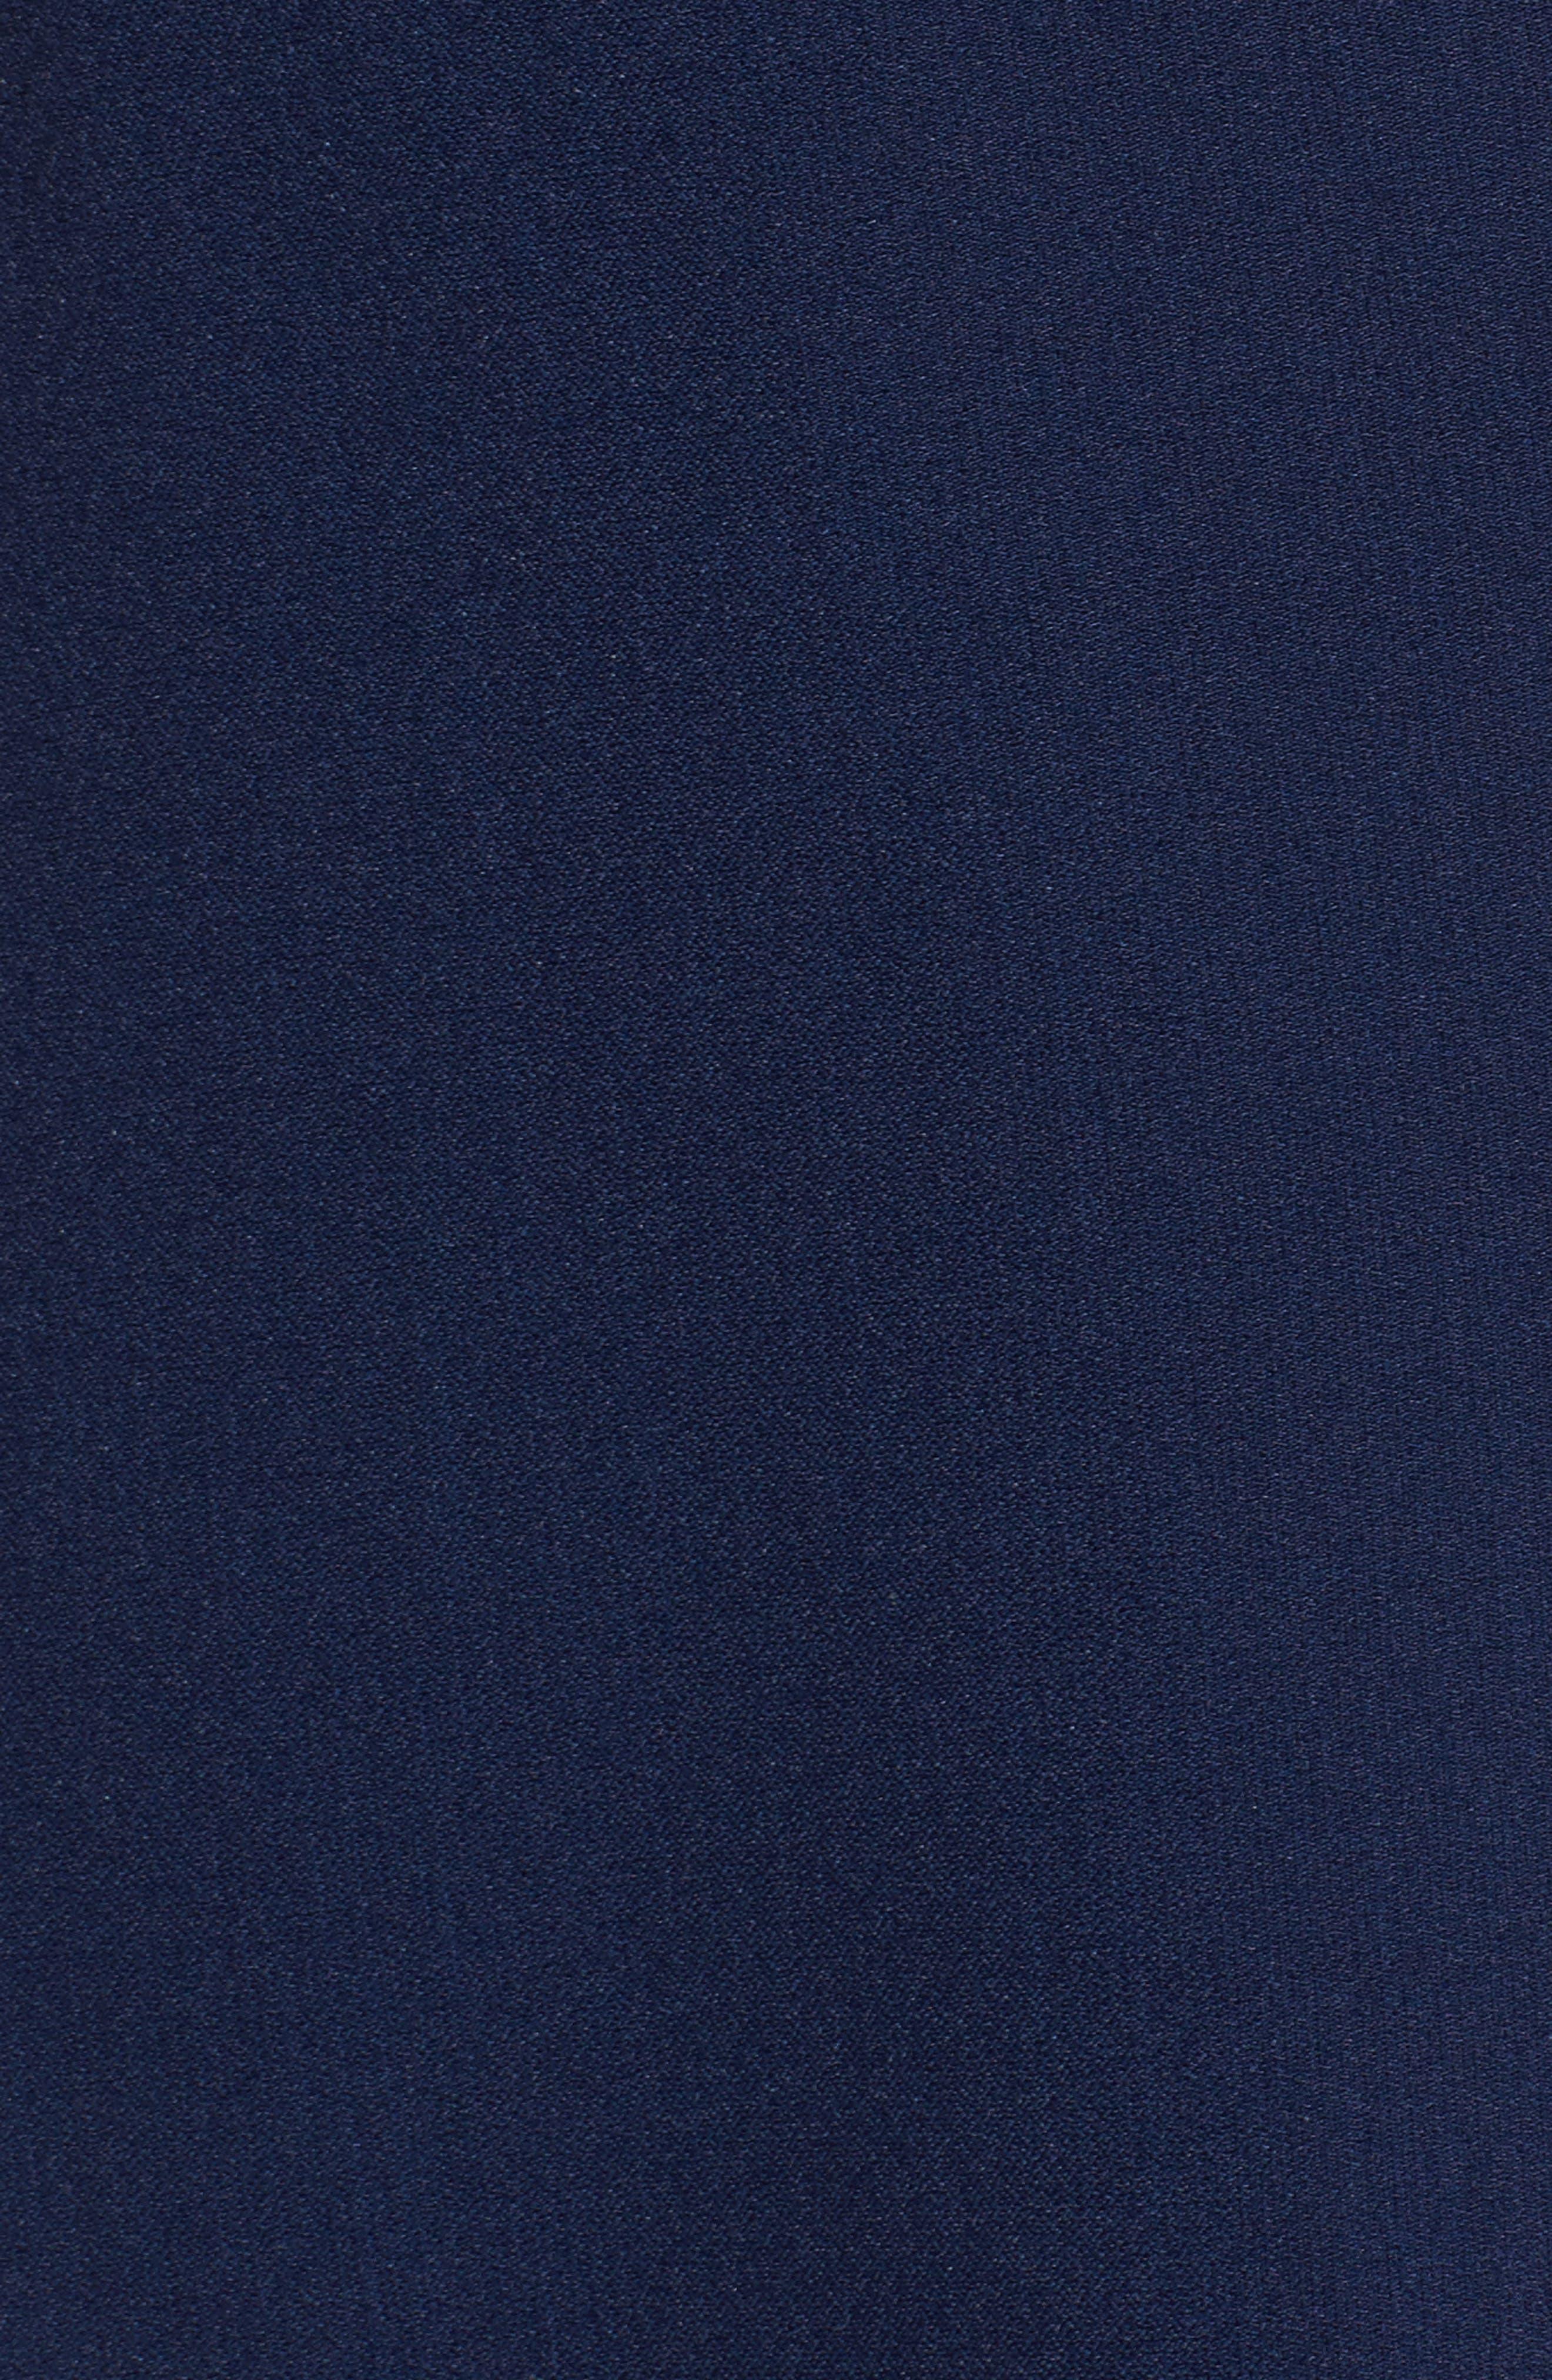 Stretch Crepe A-Line Dress,                             Alternate thumbnail 5, color,                             413